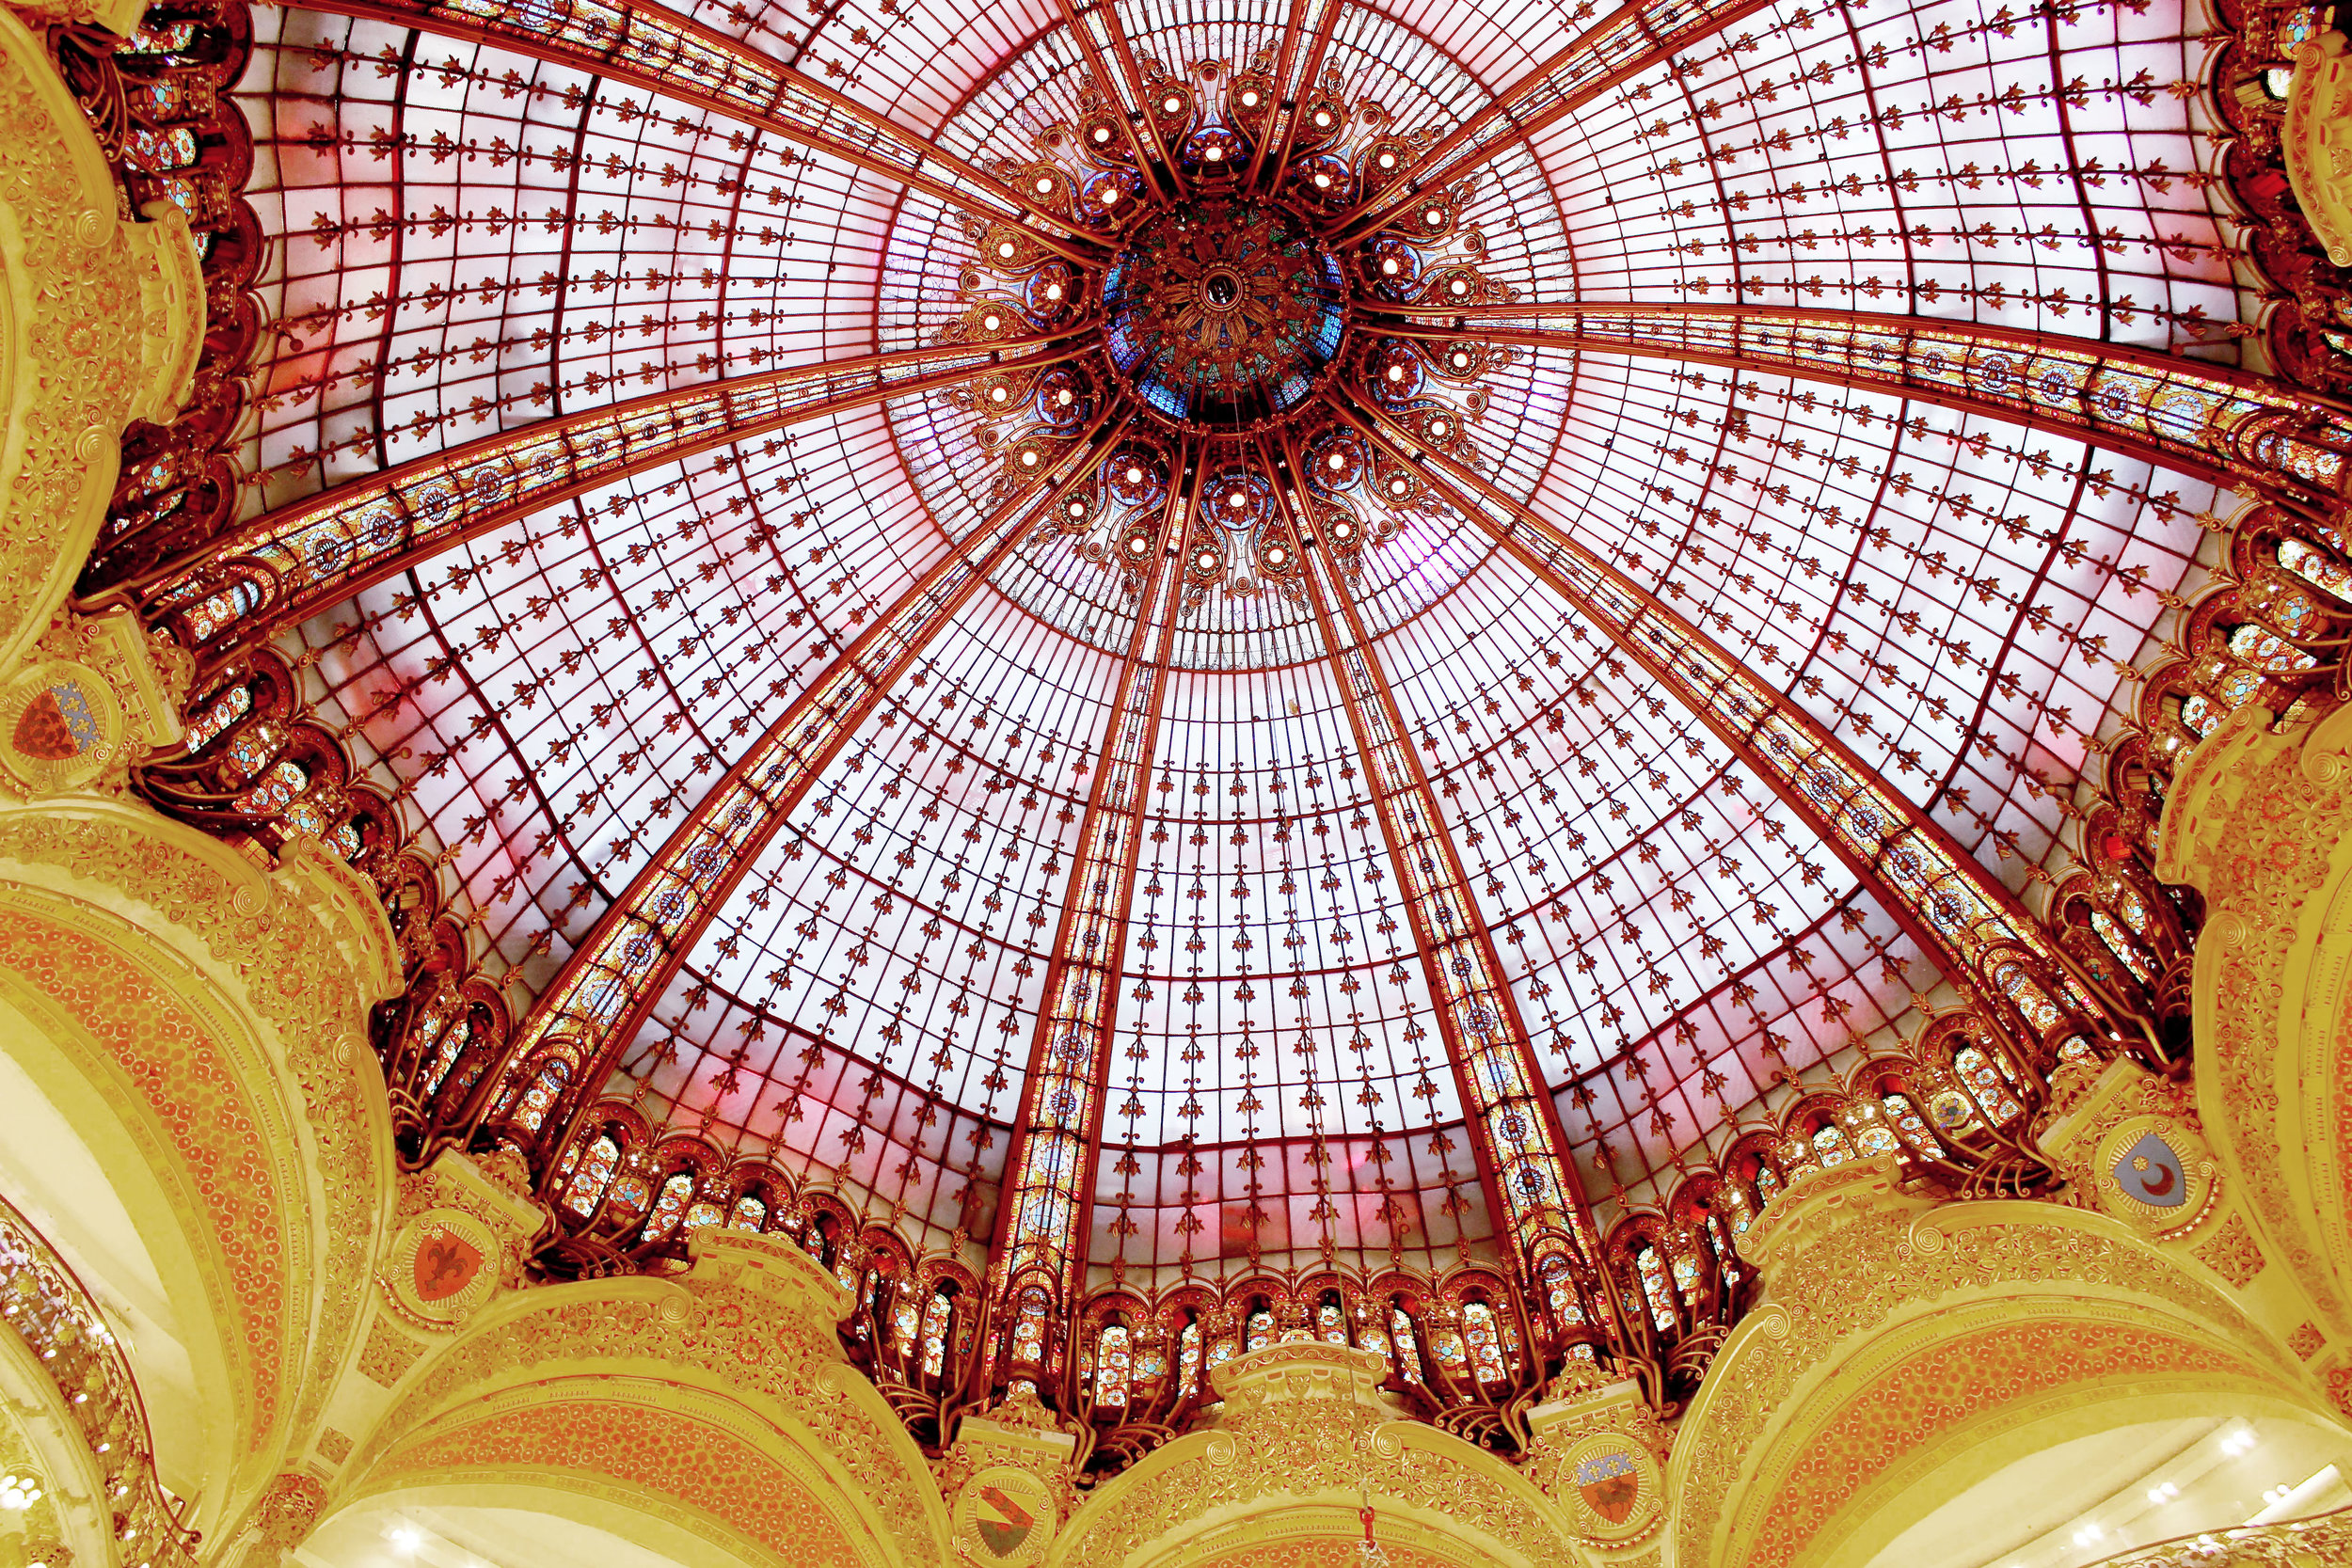 Stunning detail at Galleries Lafayette